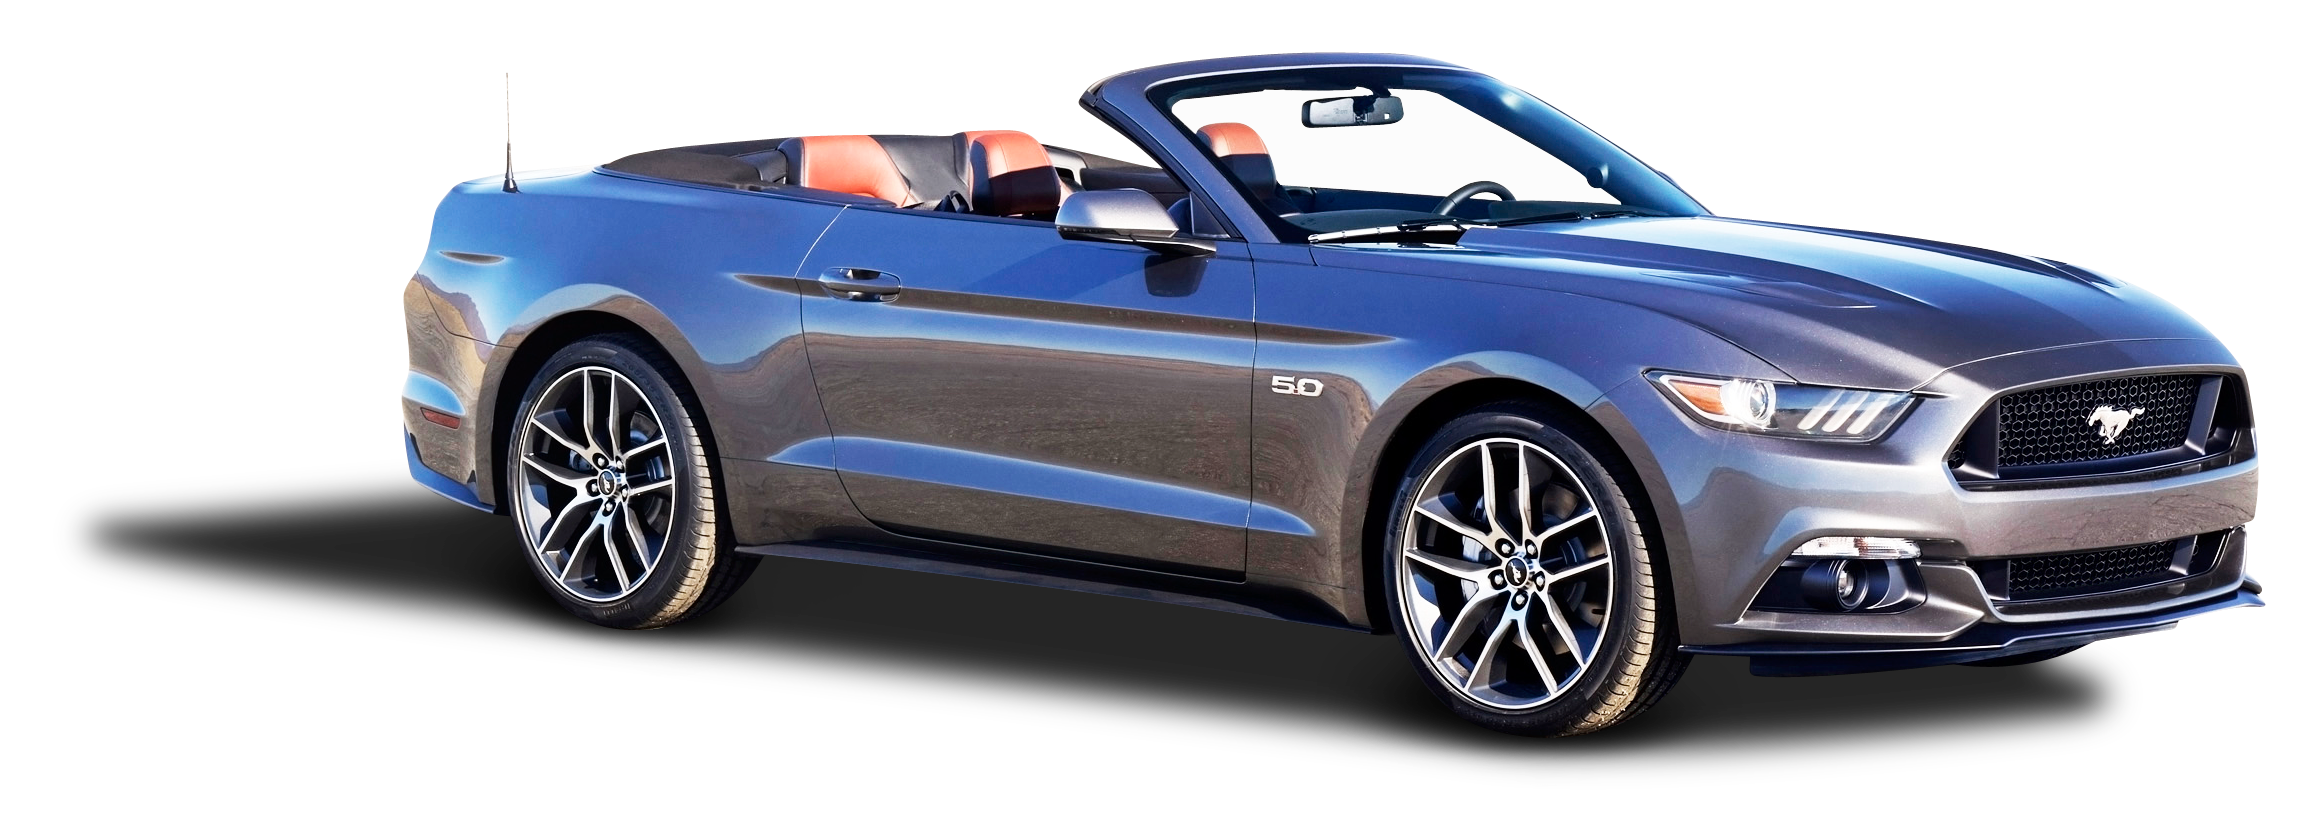 Ford Mustang Convertible Car Ford Mustang Convertible Mustang Convertible Car